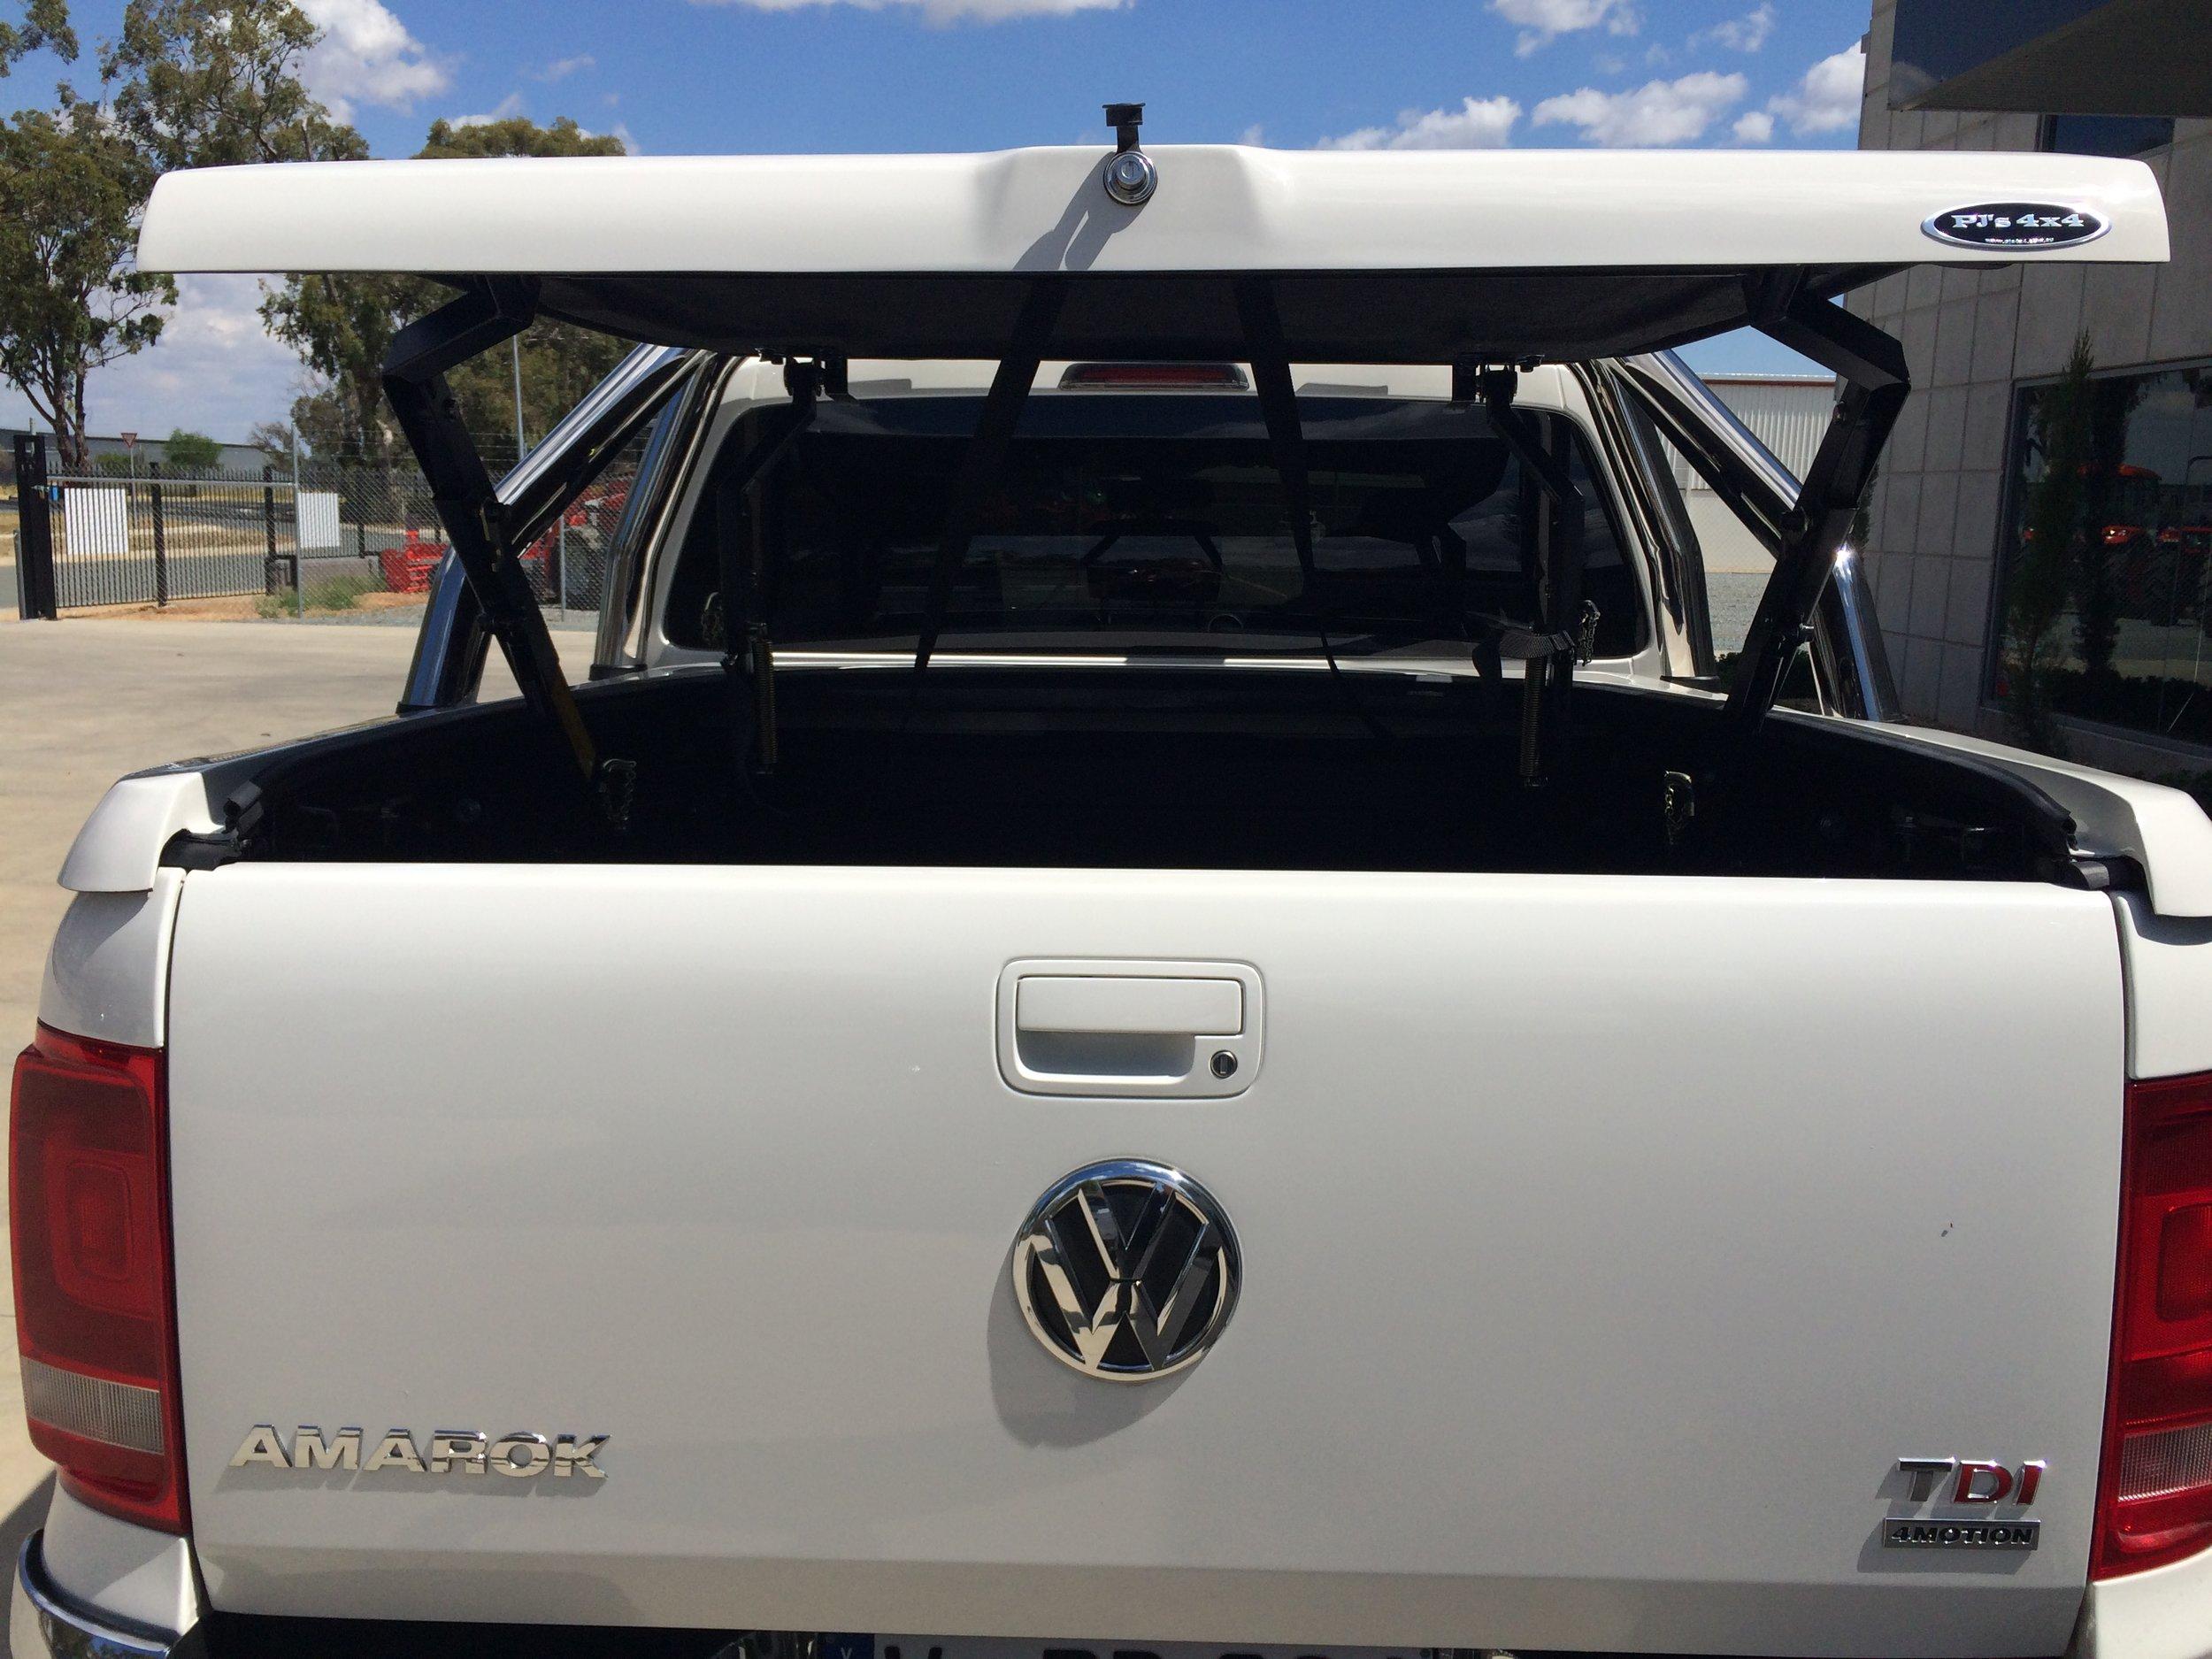 VW Amorok Top Up with OEM Bars  23.JPG